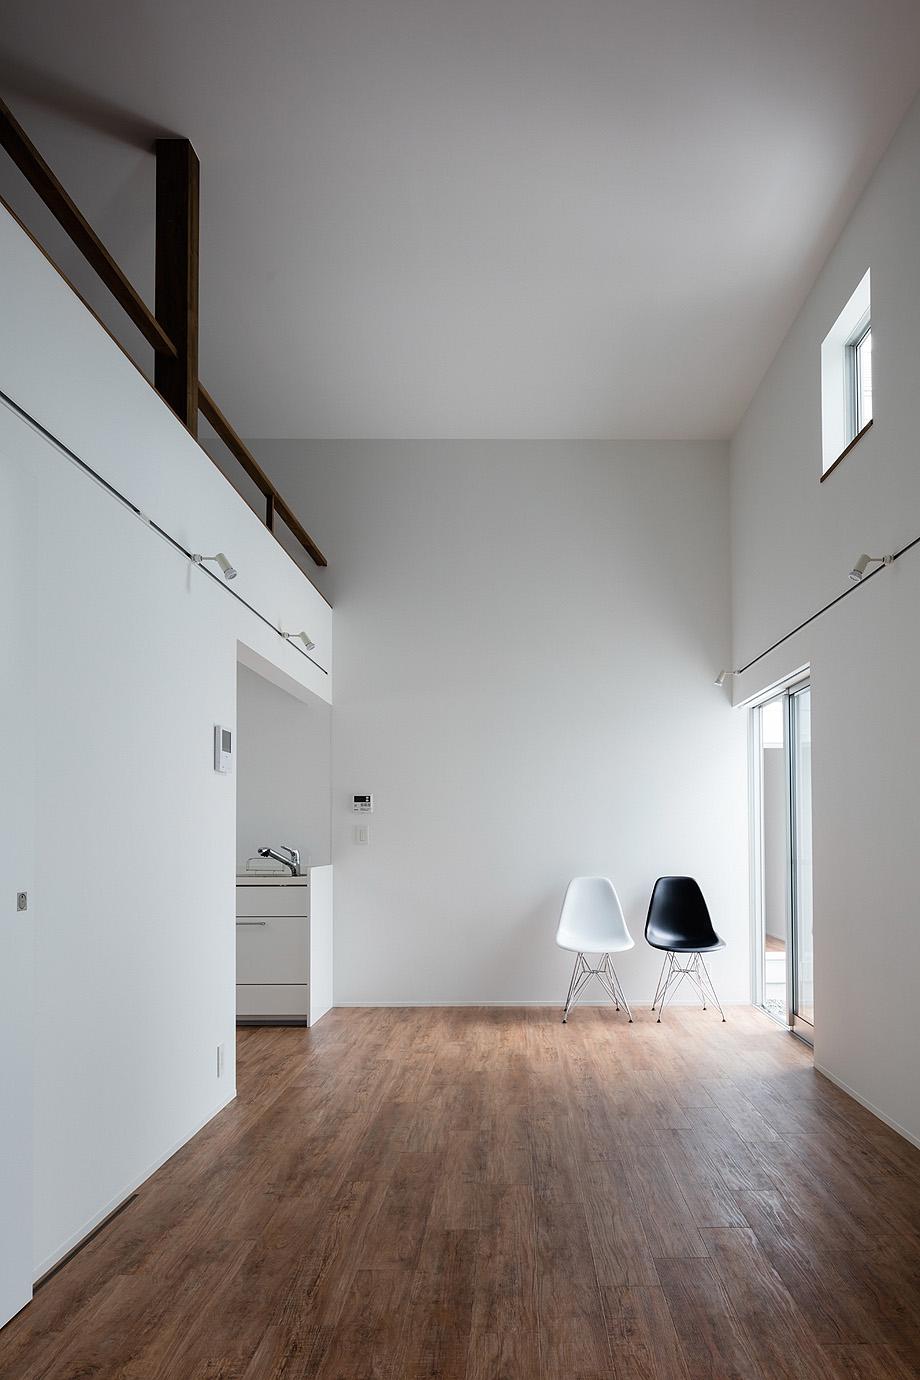 apartamentos de alquiler de masahiko fujimori - foto shigeo owaga (13)